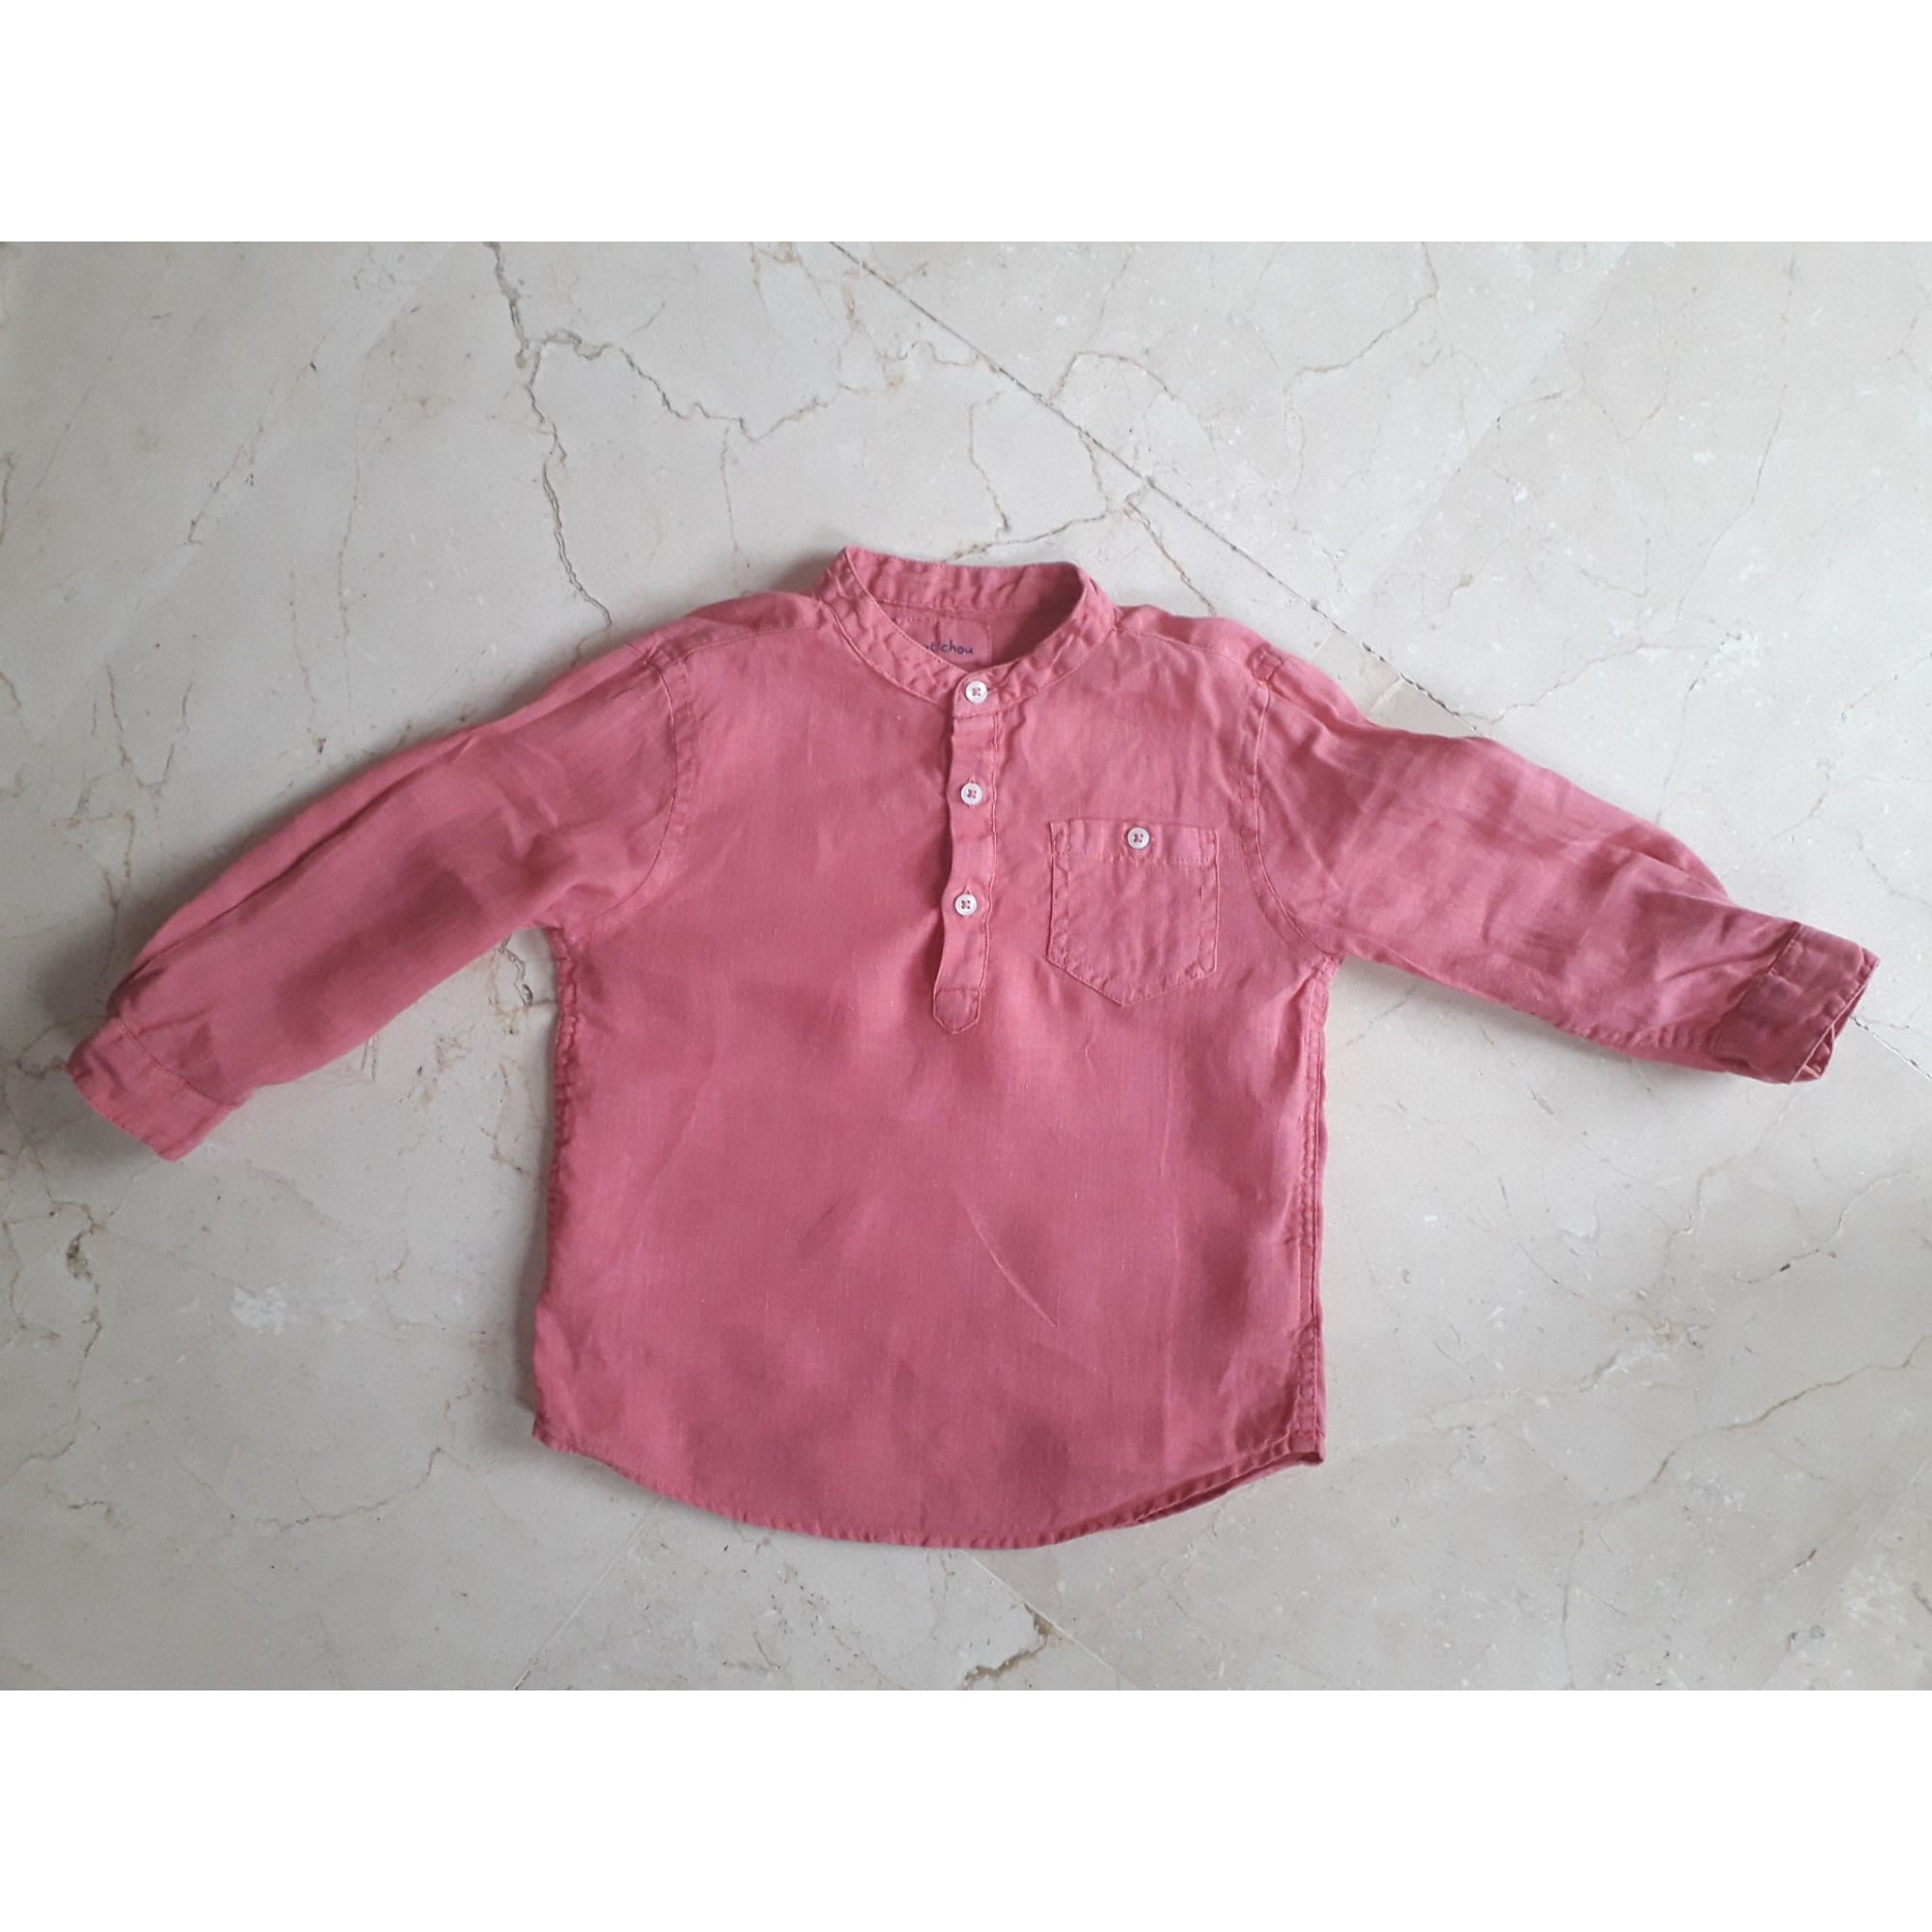 Top, T-shirt BOUT'CHOU Pink, fuchsia, light pink